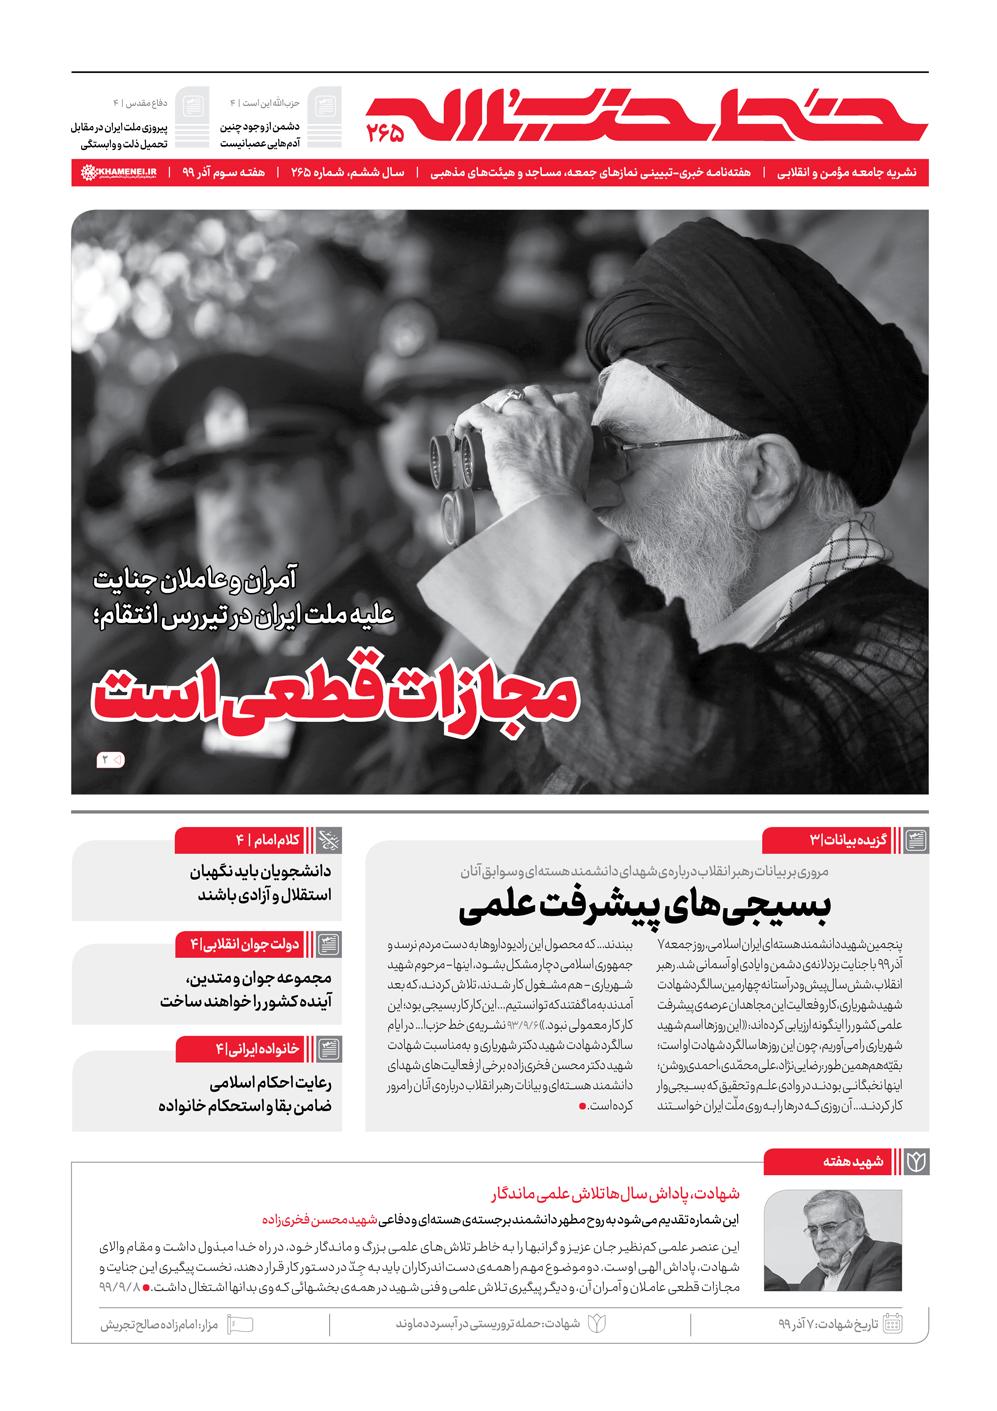 13990914000090 Test NewPhotoFree - خط حزبالله| مجازات قطعی است